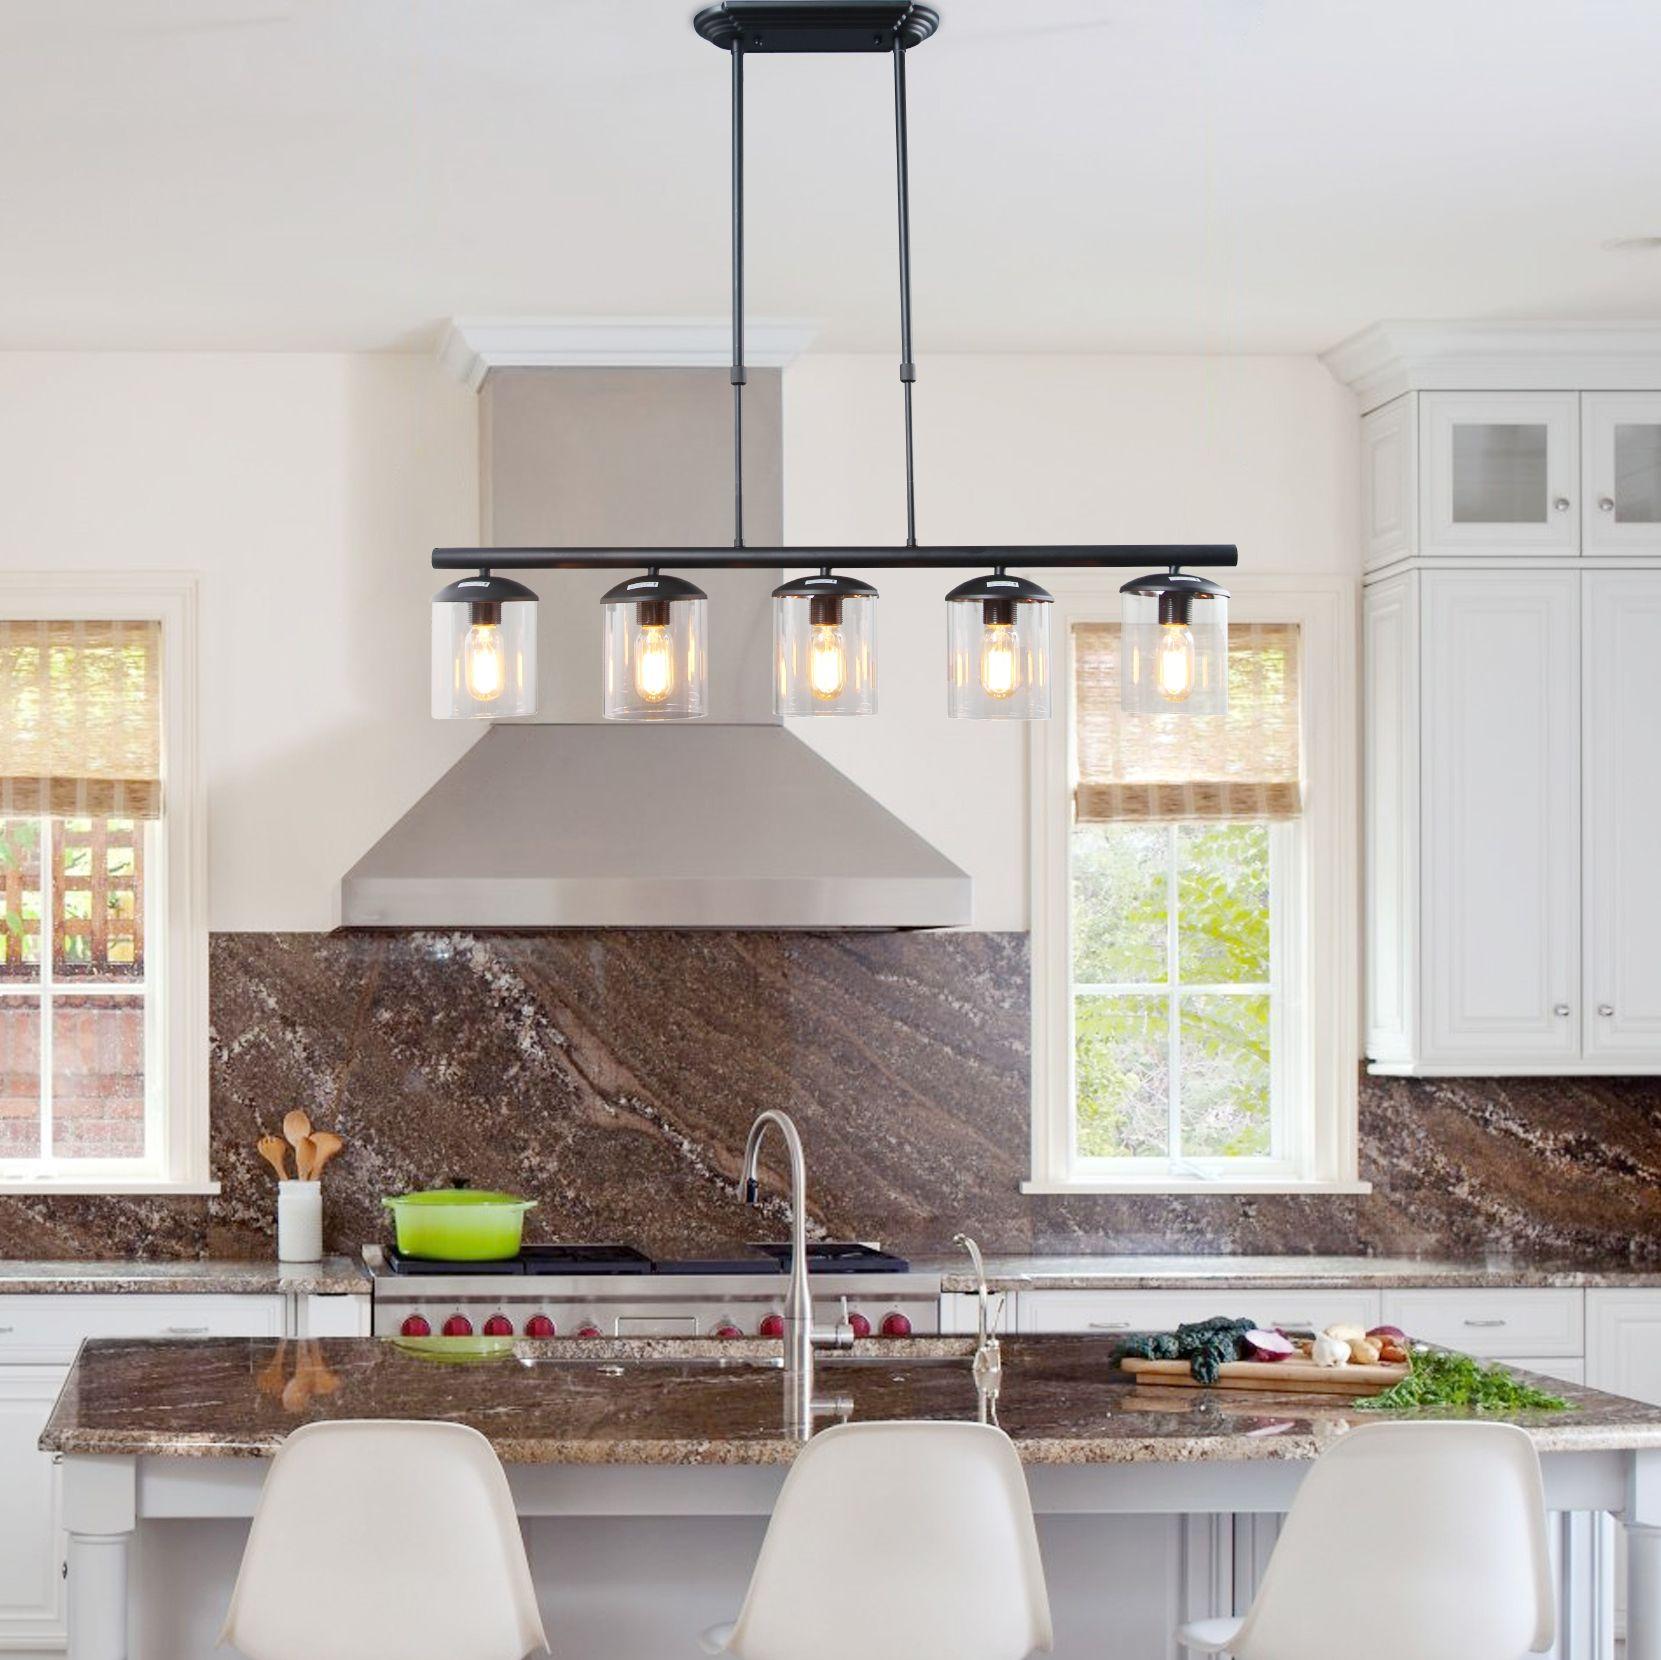 Linear Modern Pendant 5 Lights Kitchen Island Lighting Island Lighting Dream Kitchens Design